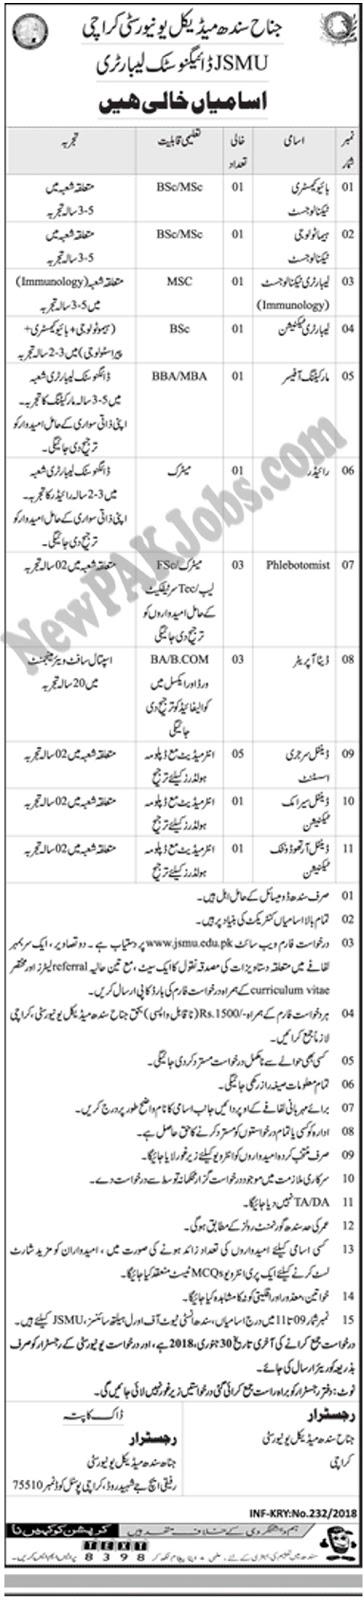 Jinnah Sindh Medical University Latest Jobs 15 Jan 2018